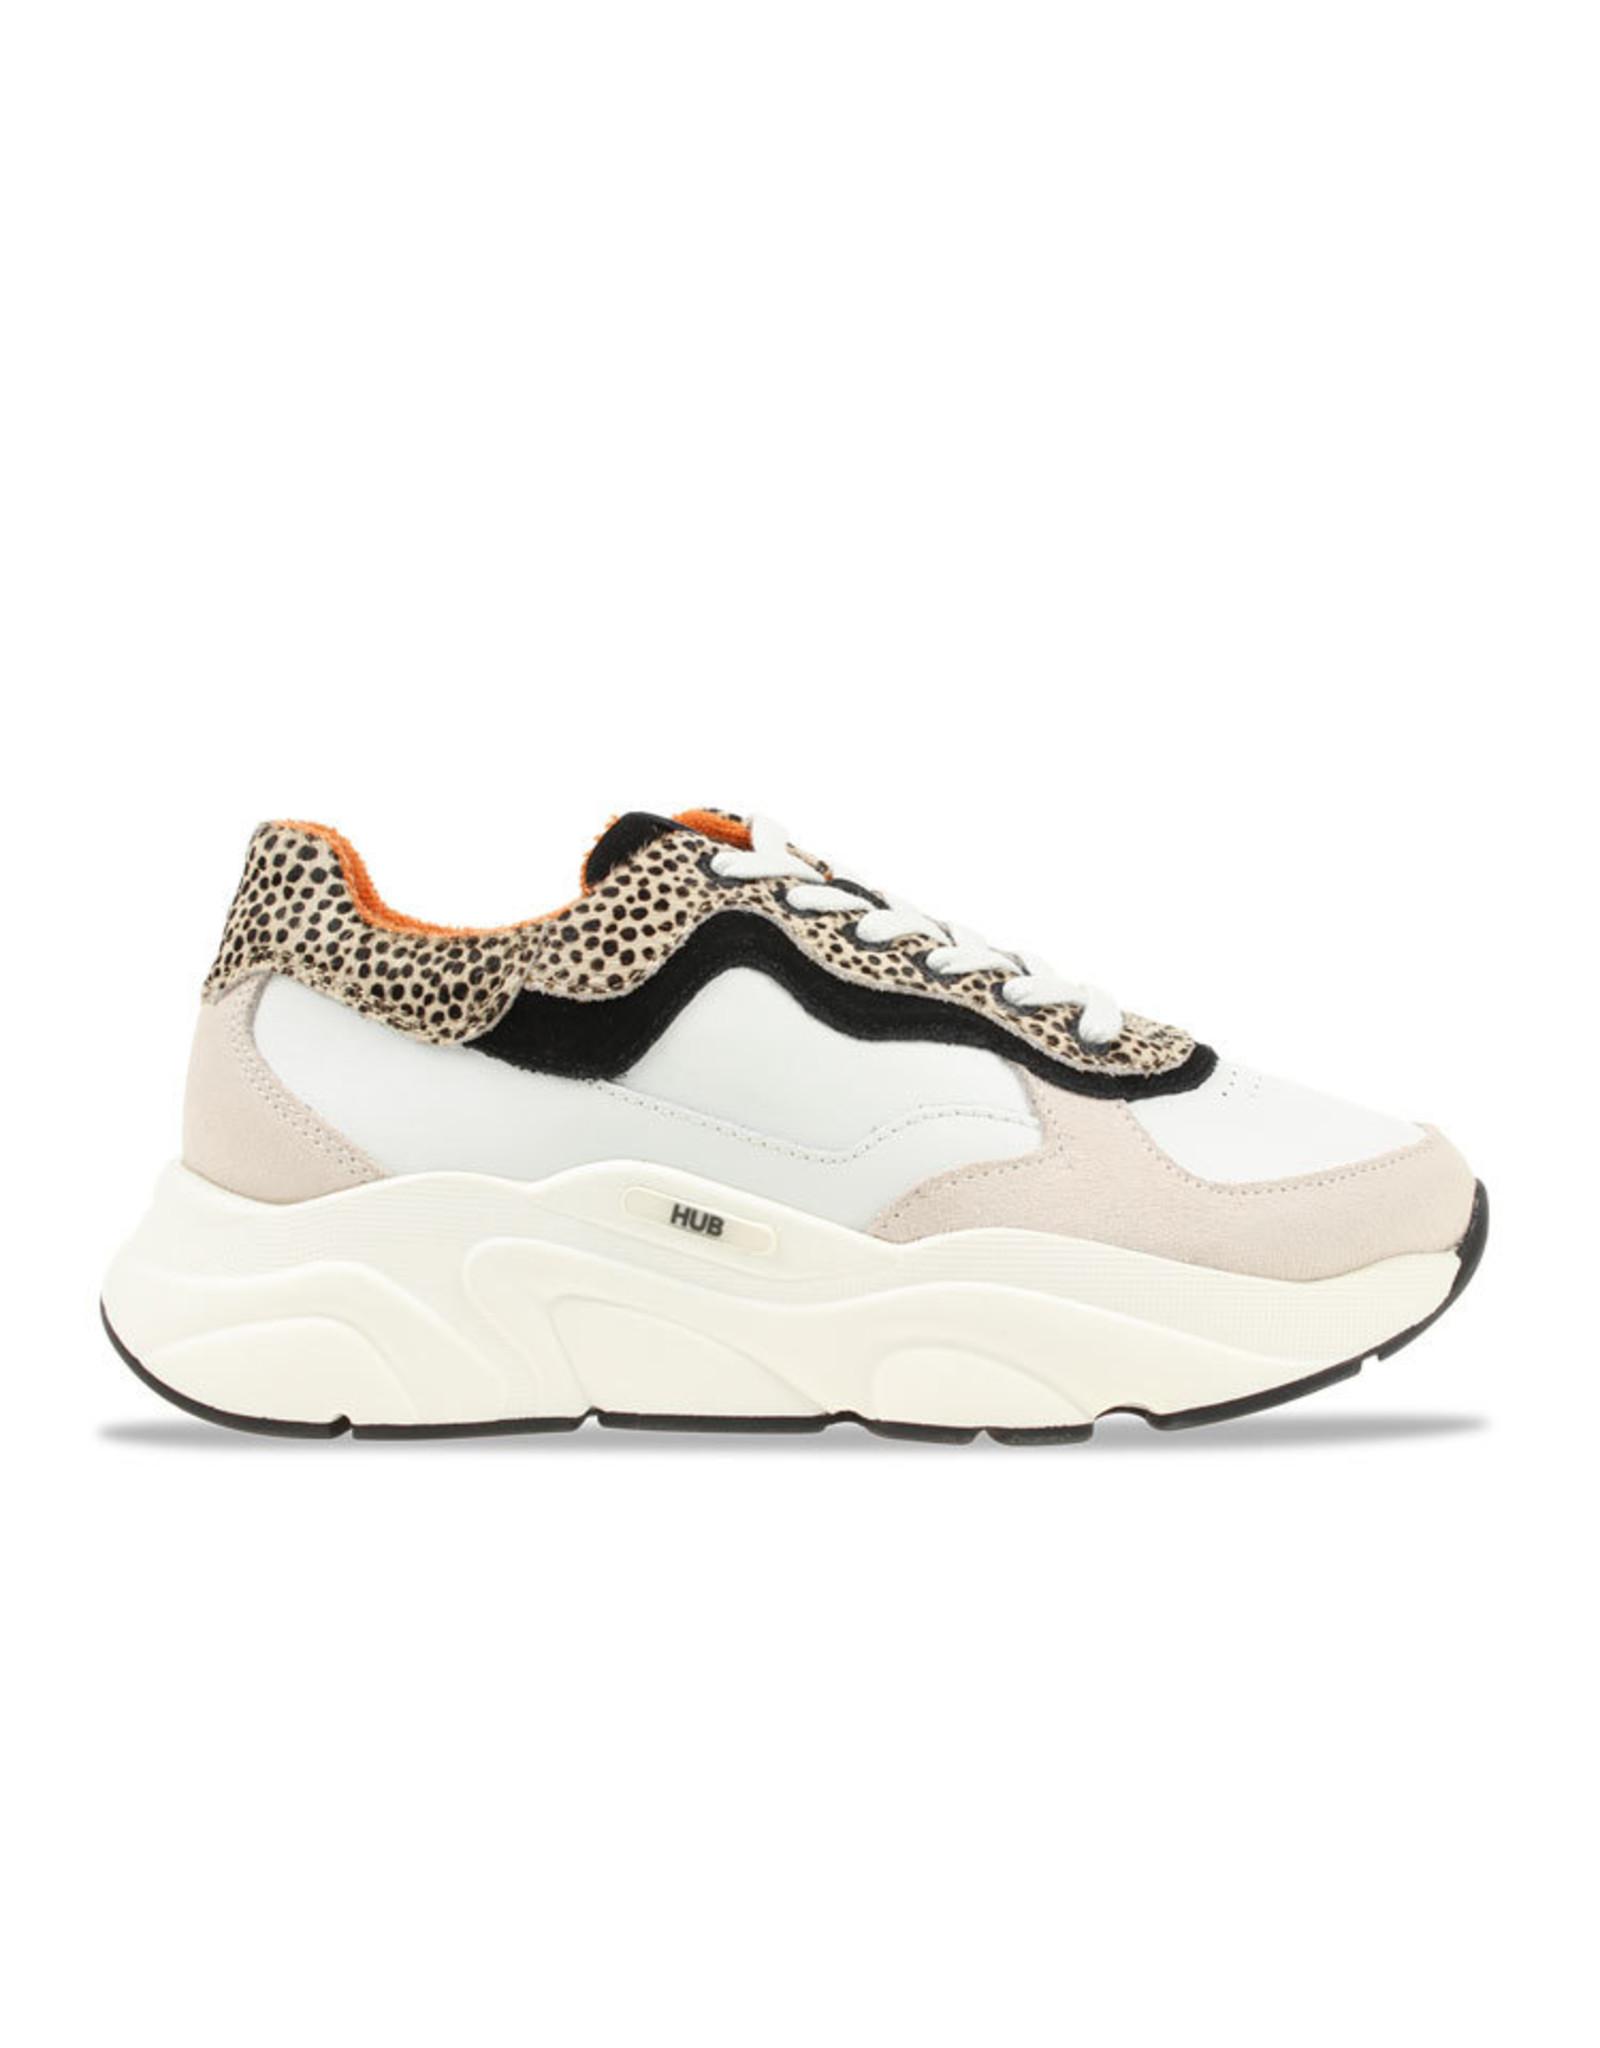 HUB Hub-Sneaker-White-Cheeta-Rock